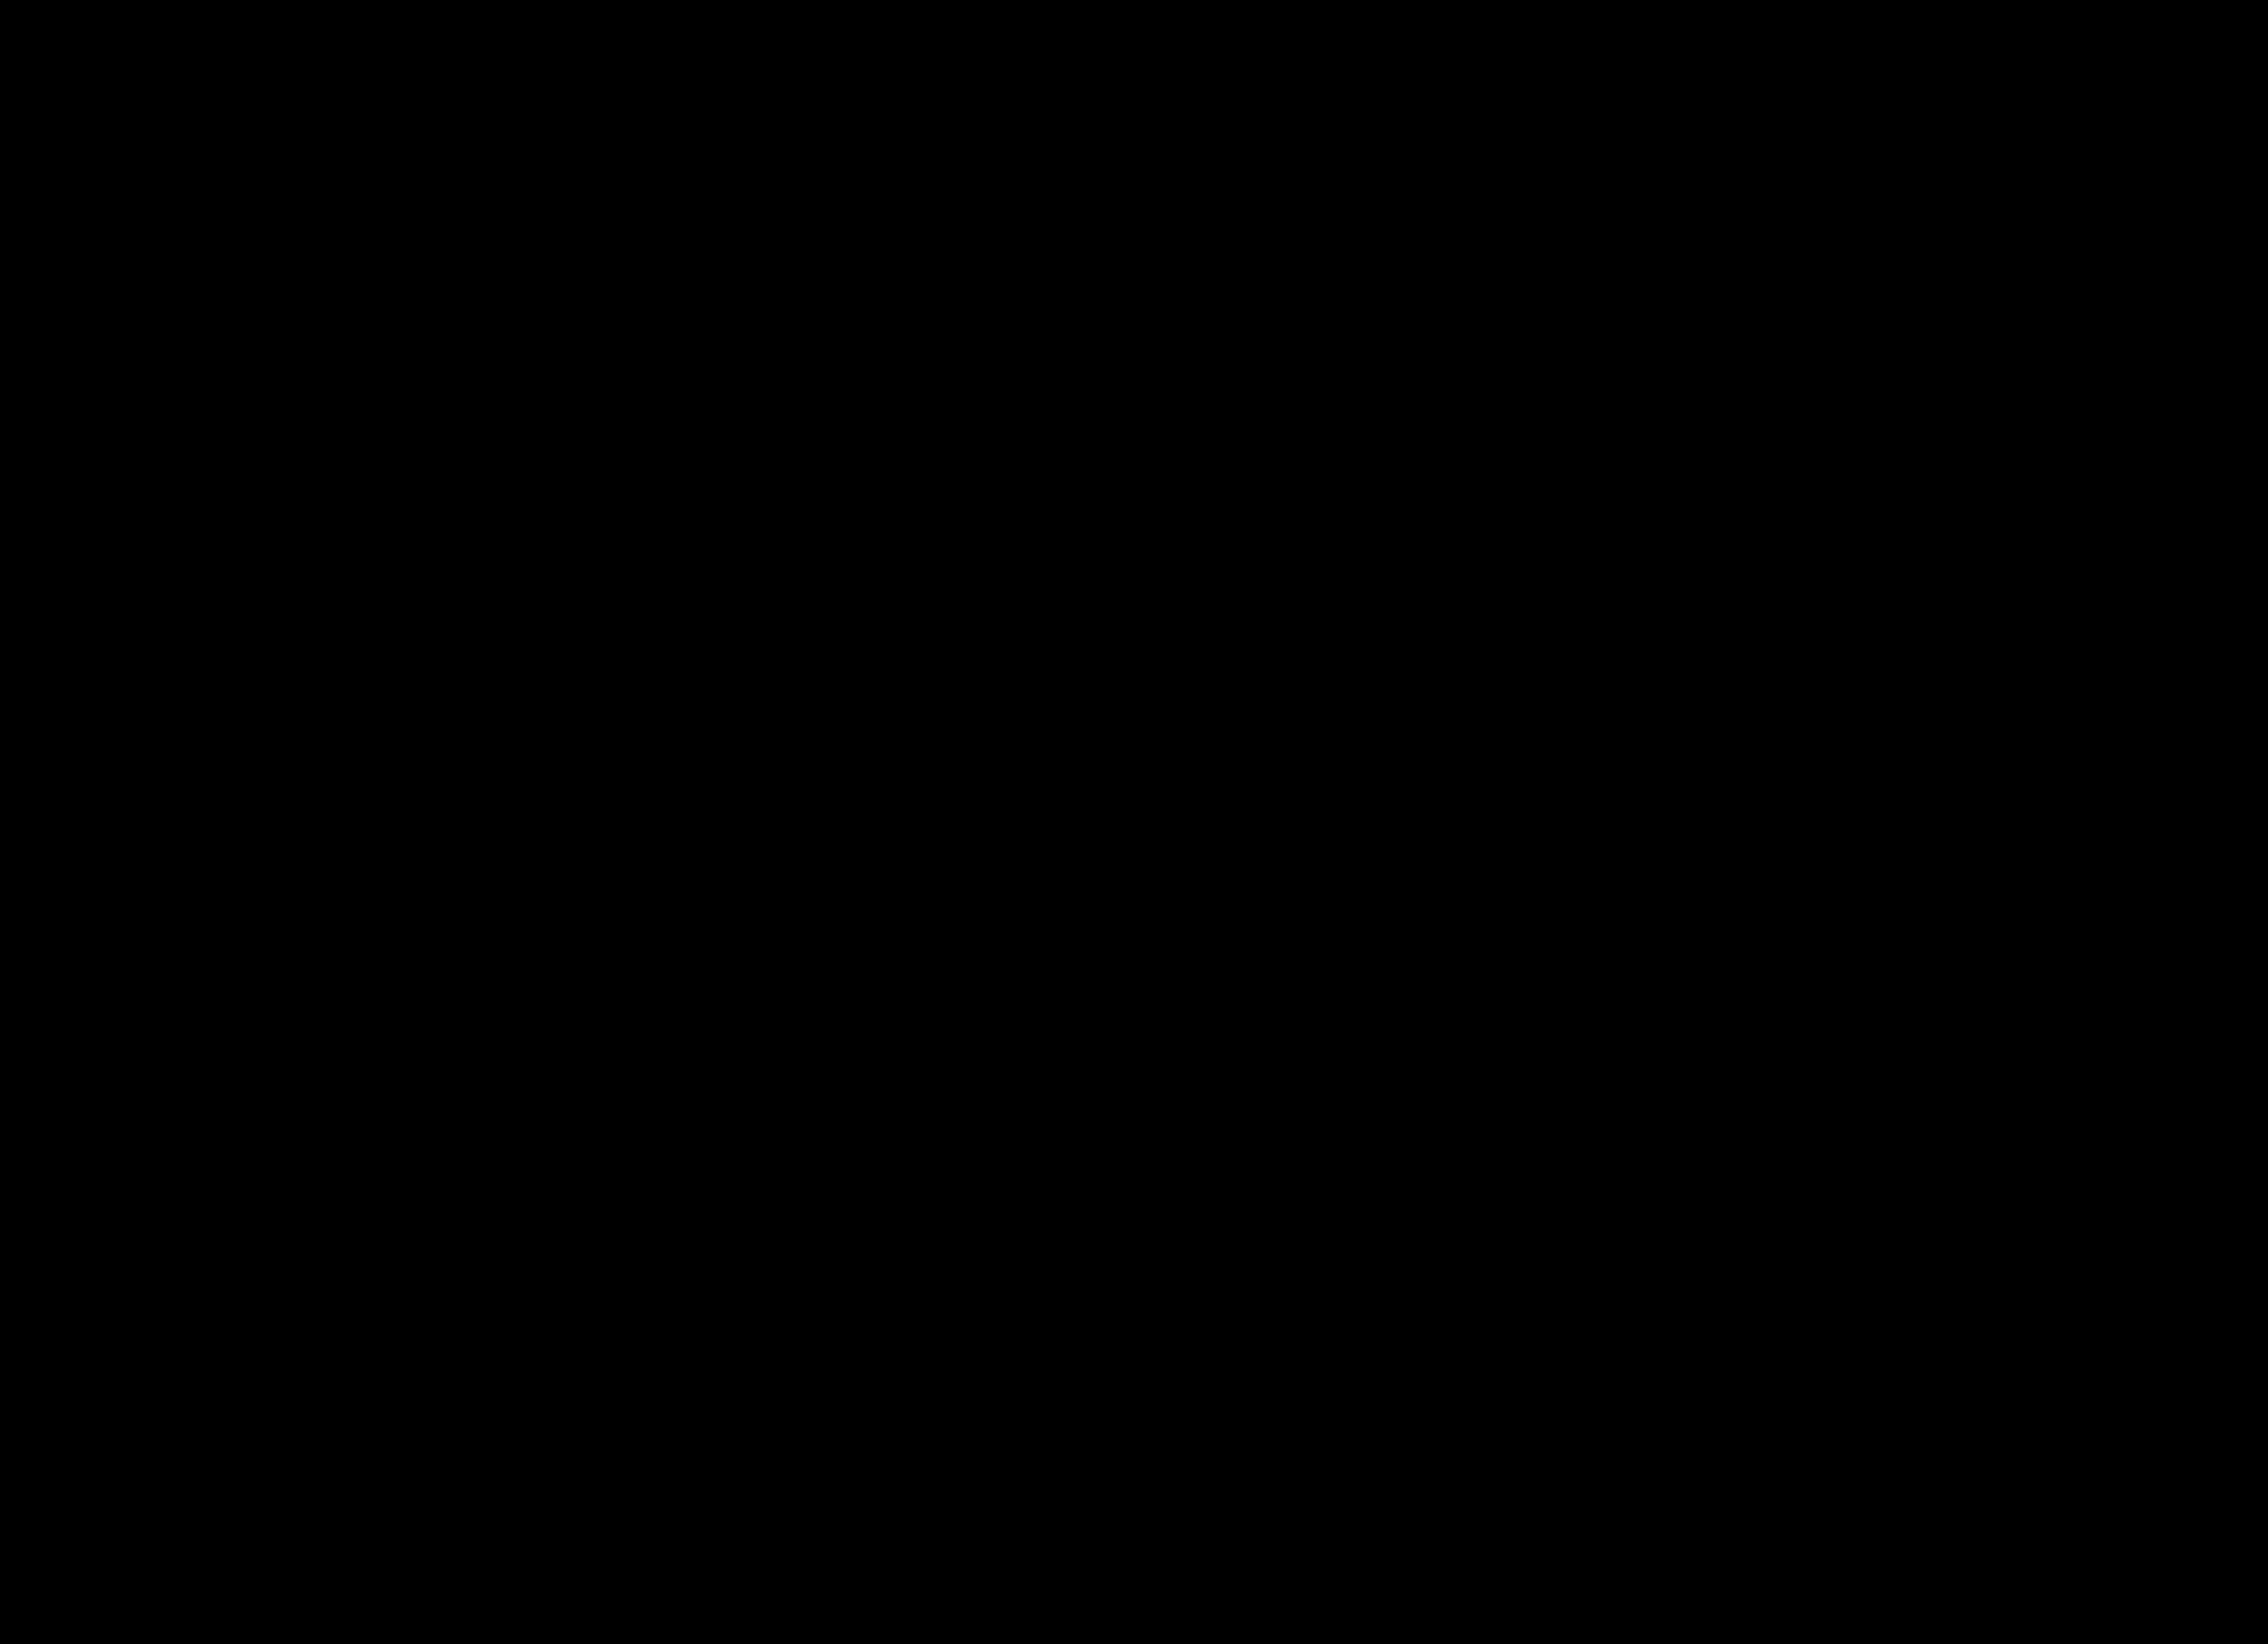 2400x1740 Clipart